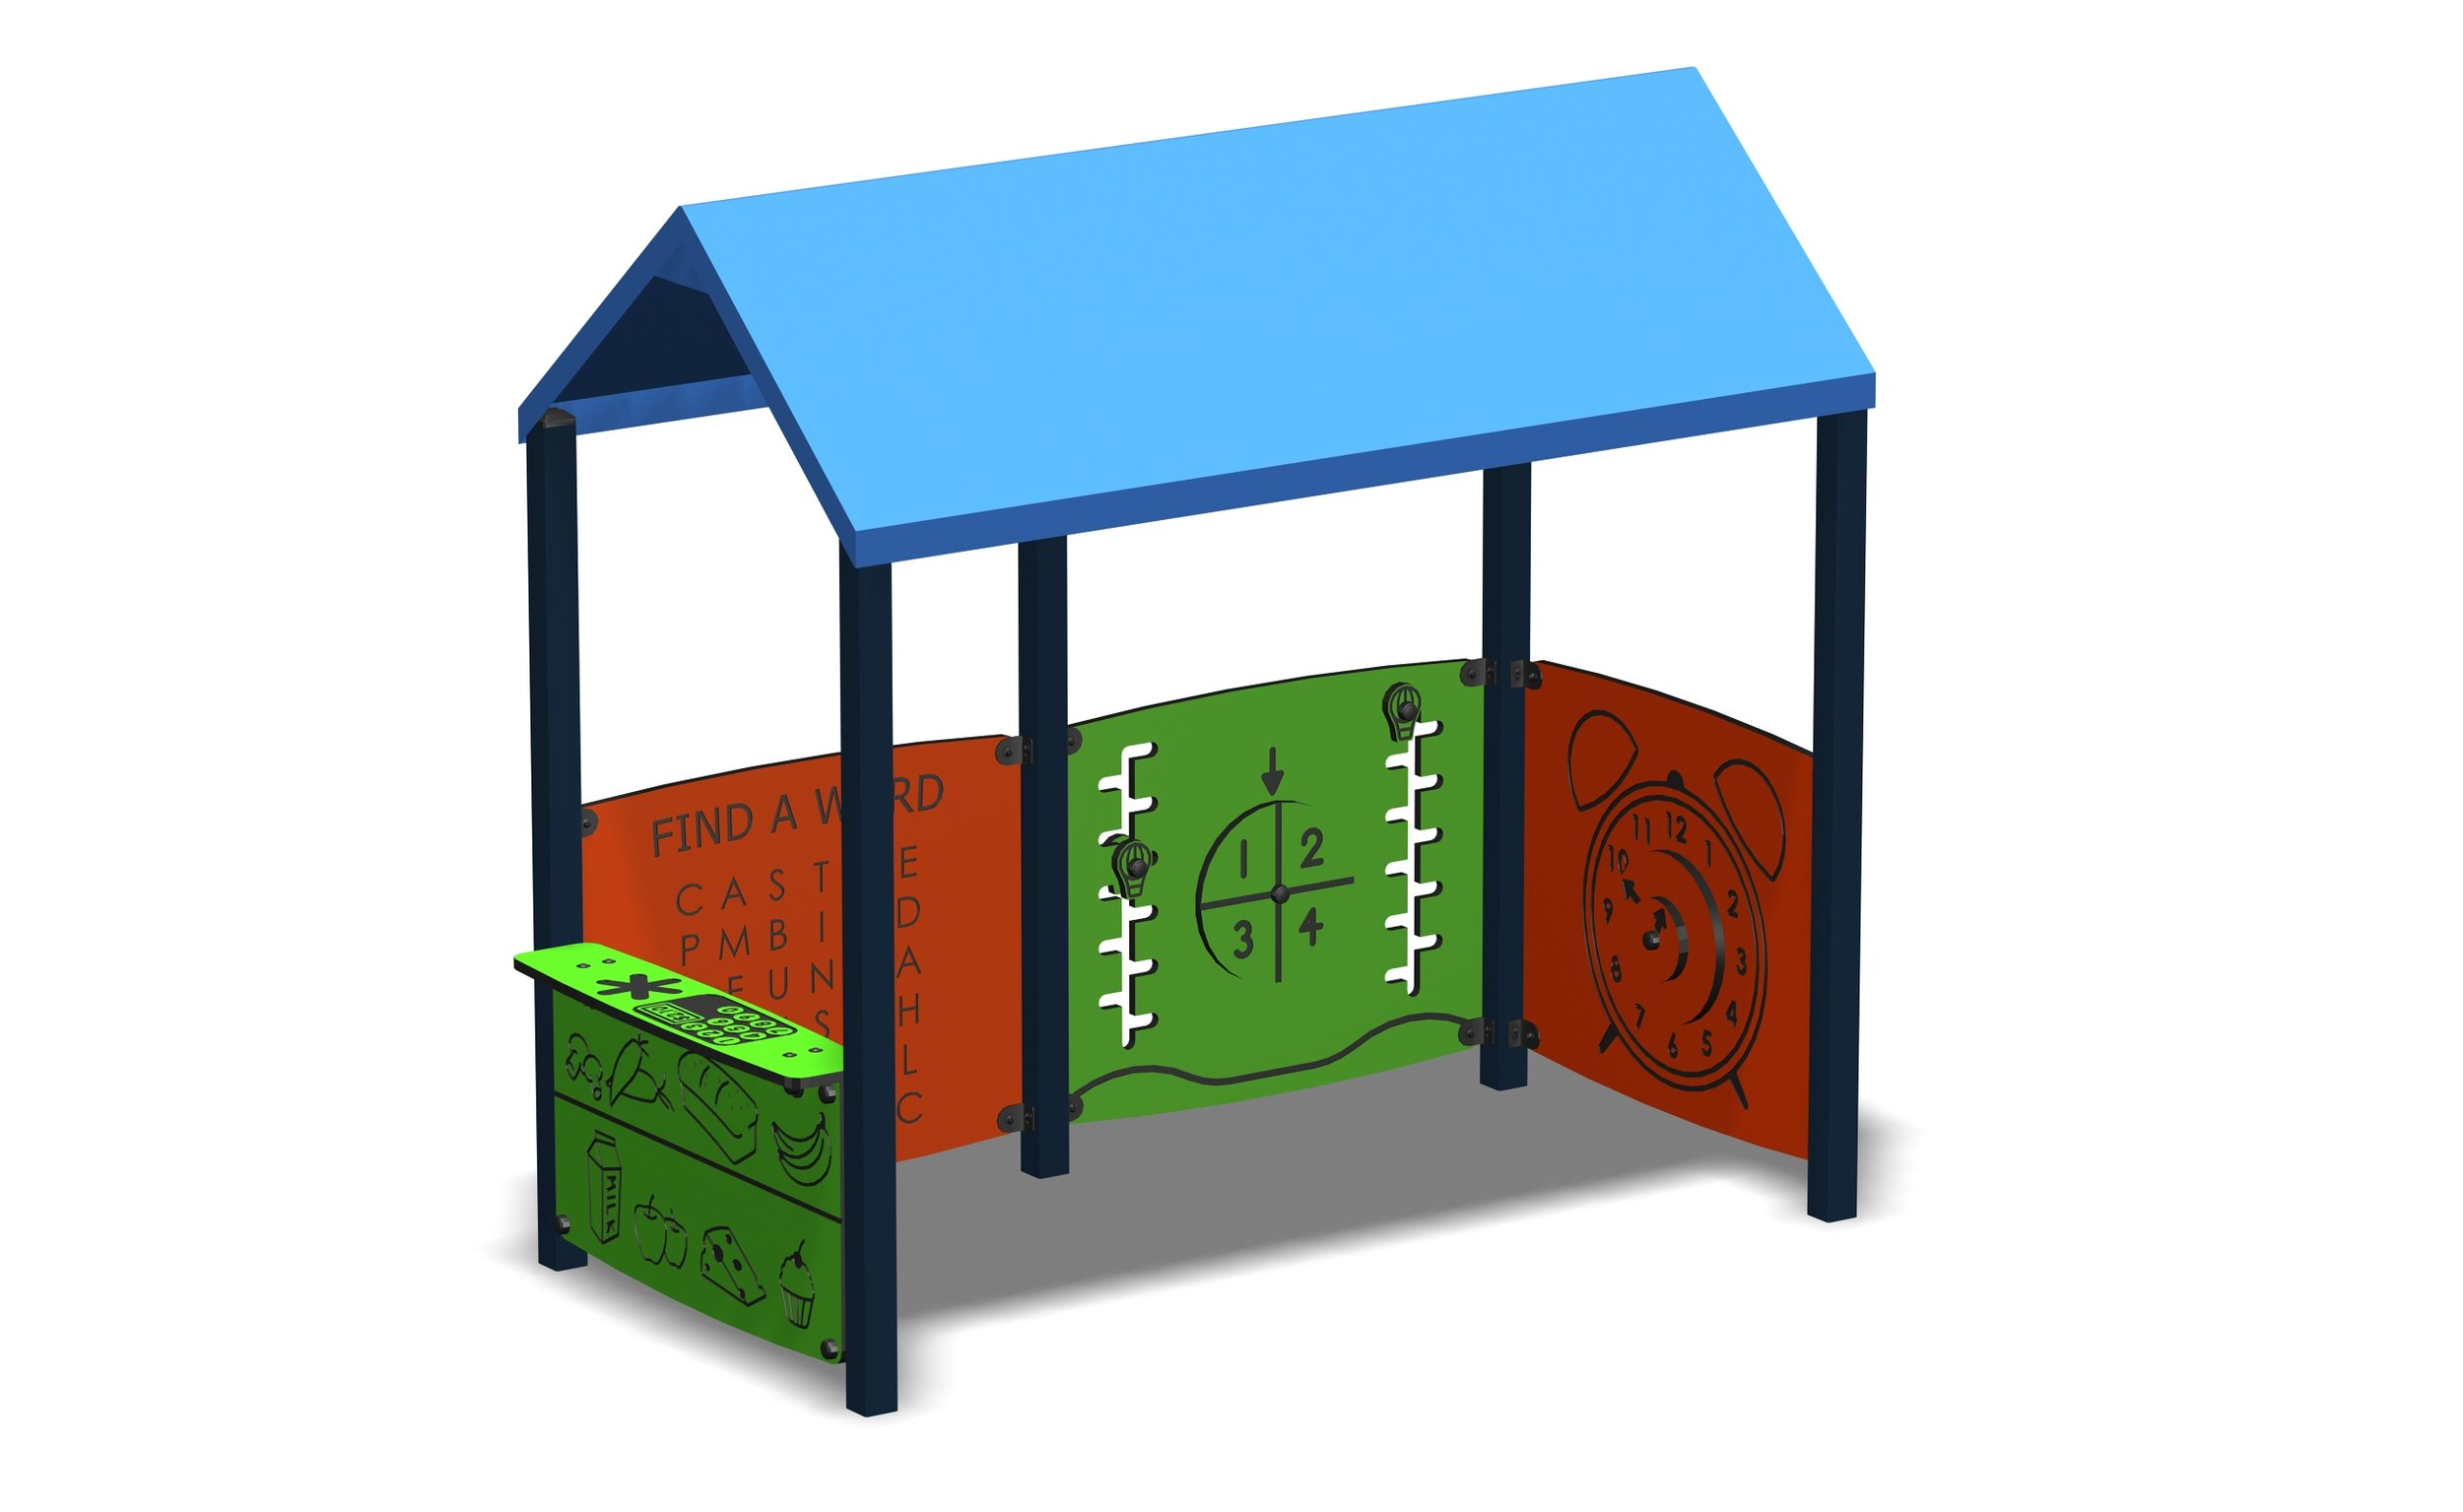 One of Omnitechs sensory huts